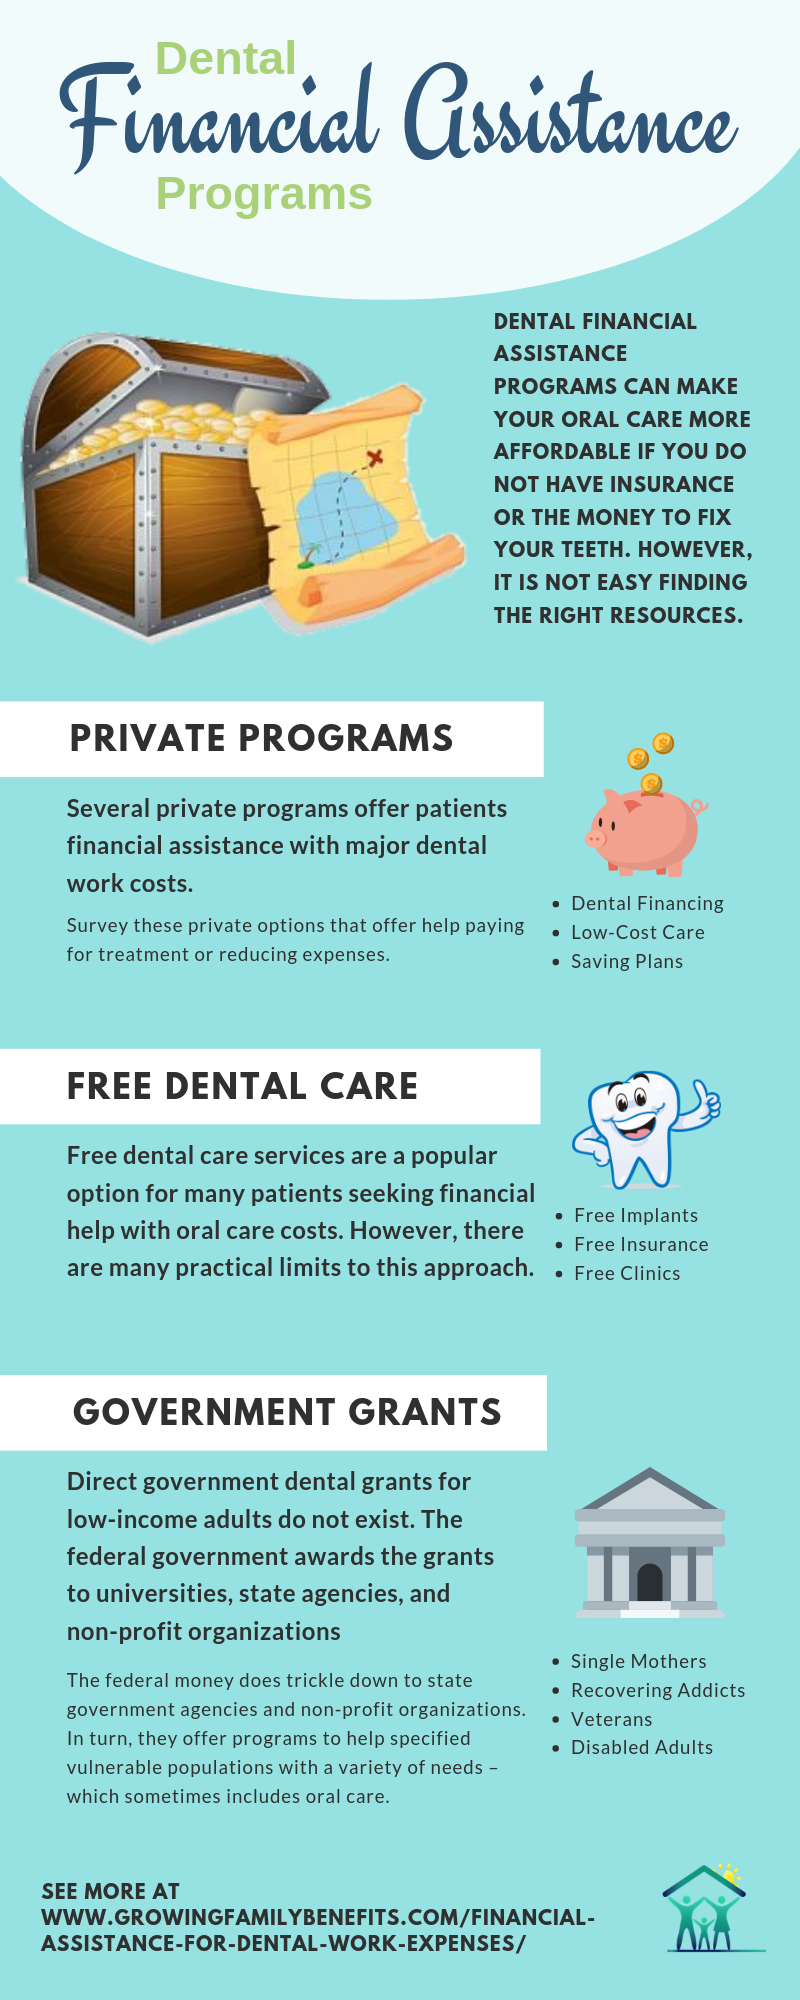 Dental Financial Assistance Programs Grants Free Care Dental Help Financial Assistance Dental